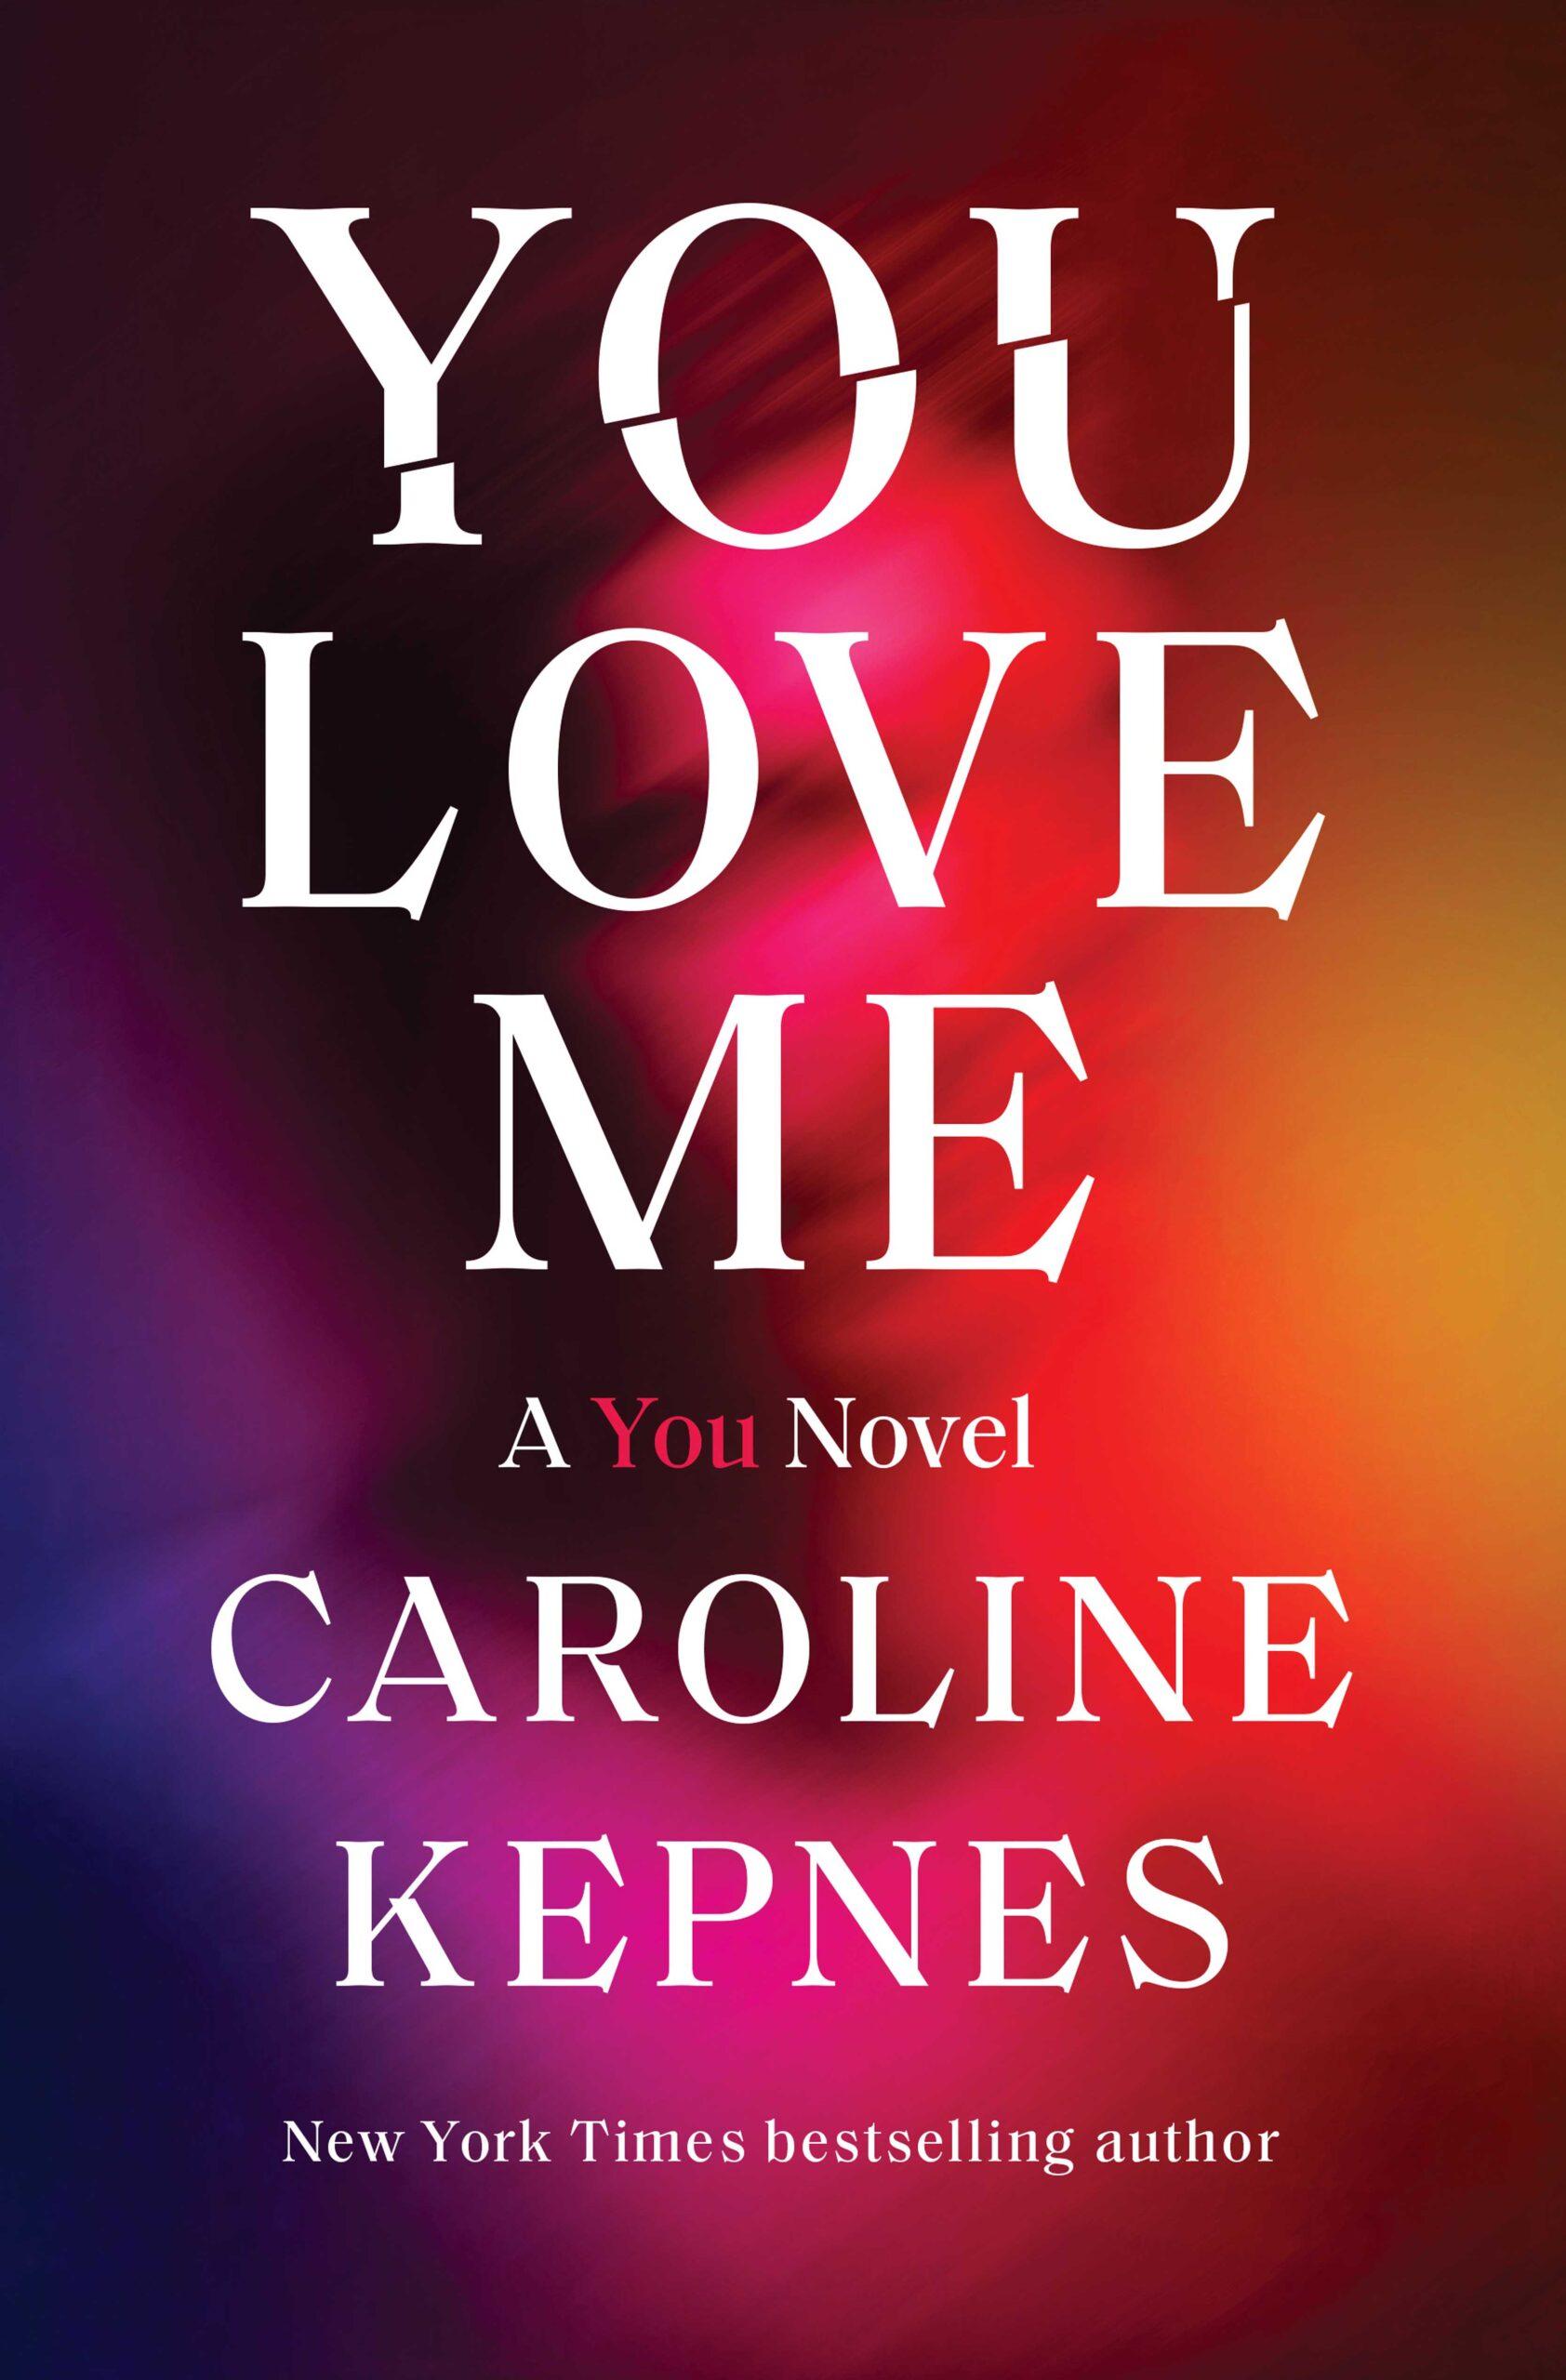 Caroline Kepnes' You Love Me (Random House)